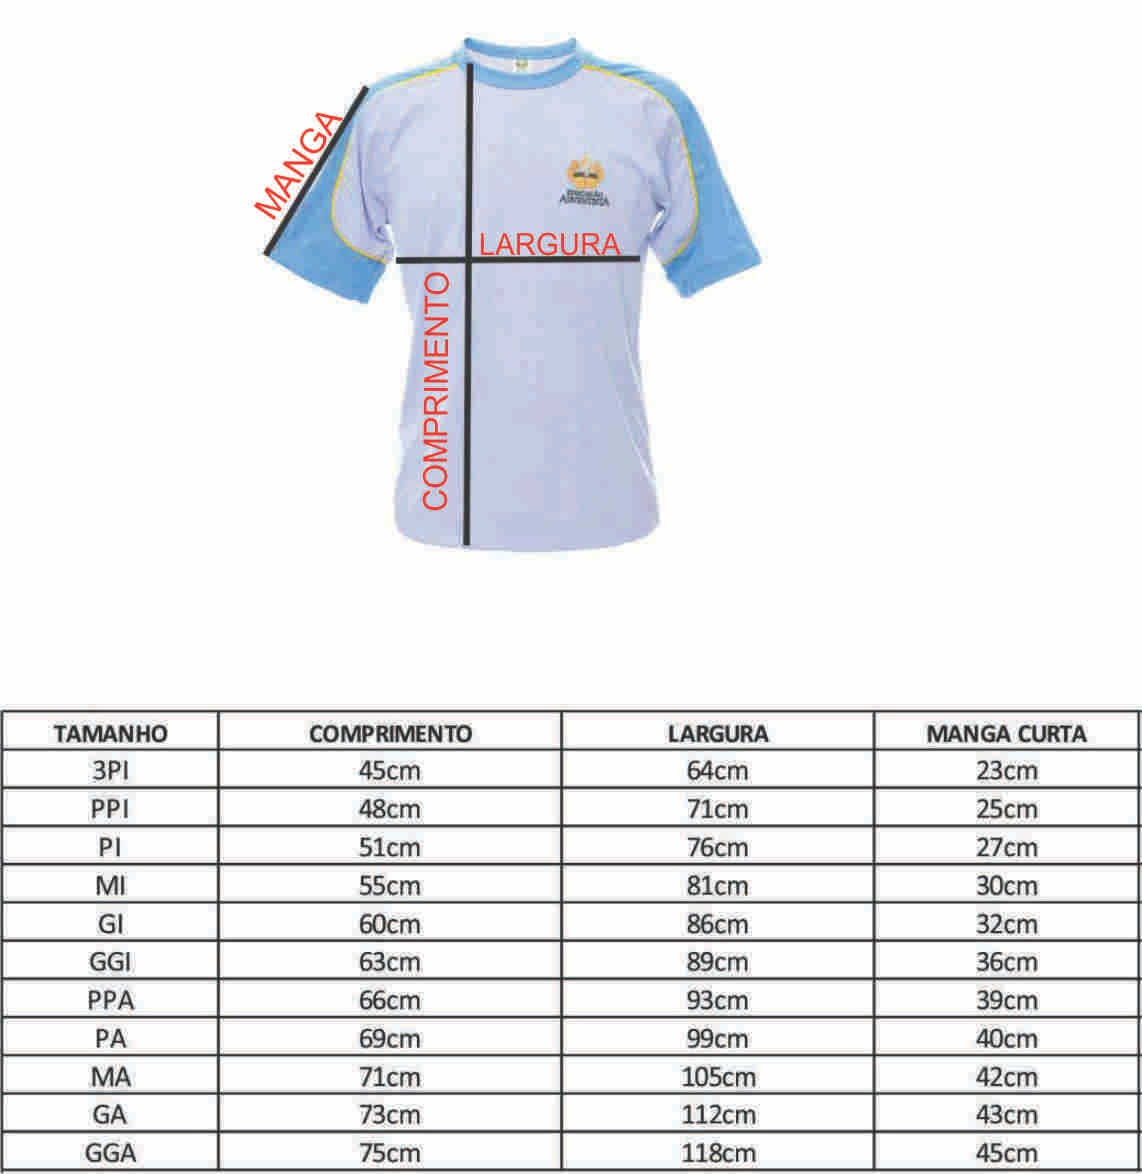 Camiseta Manga Curta - PPA ( 38 )